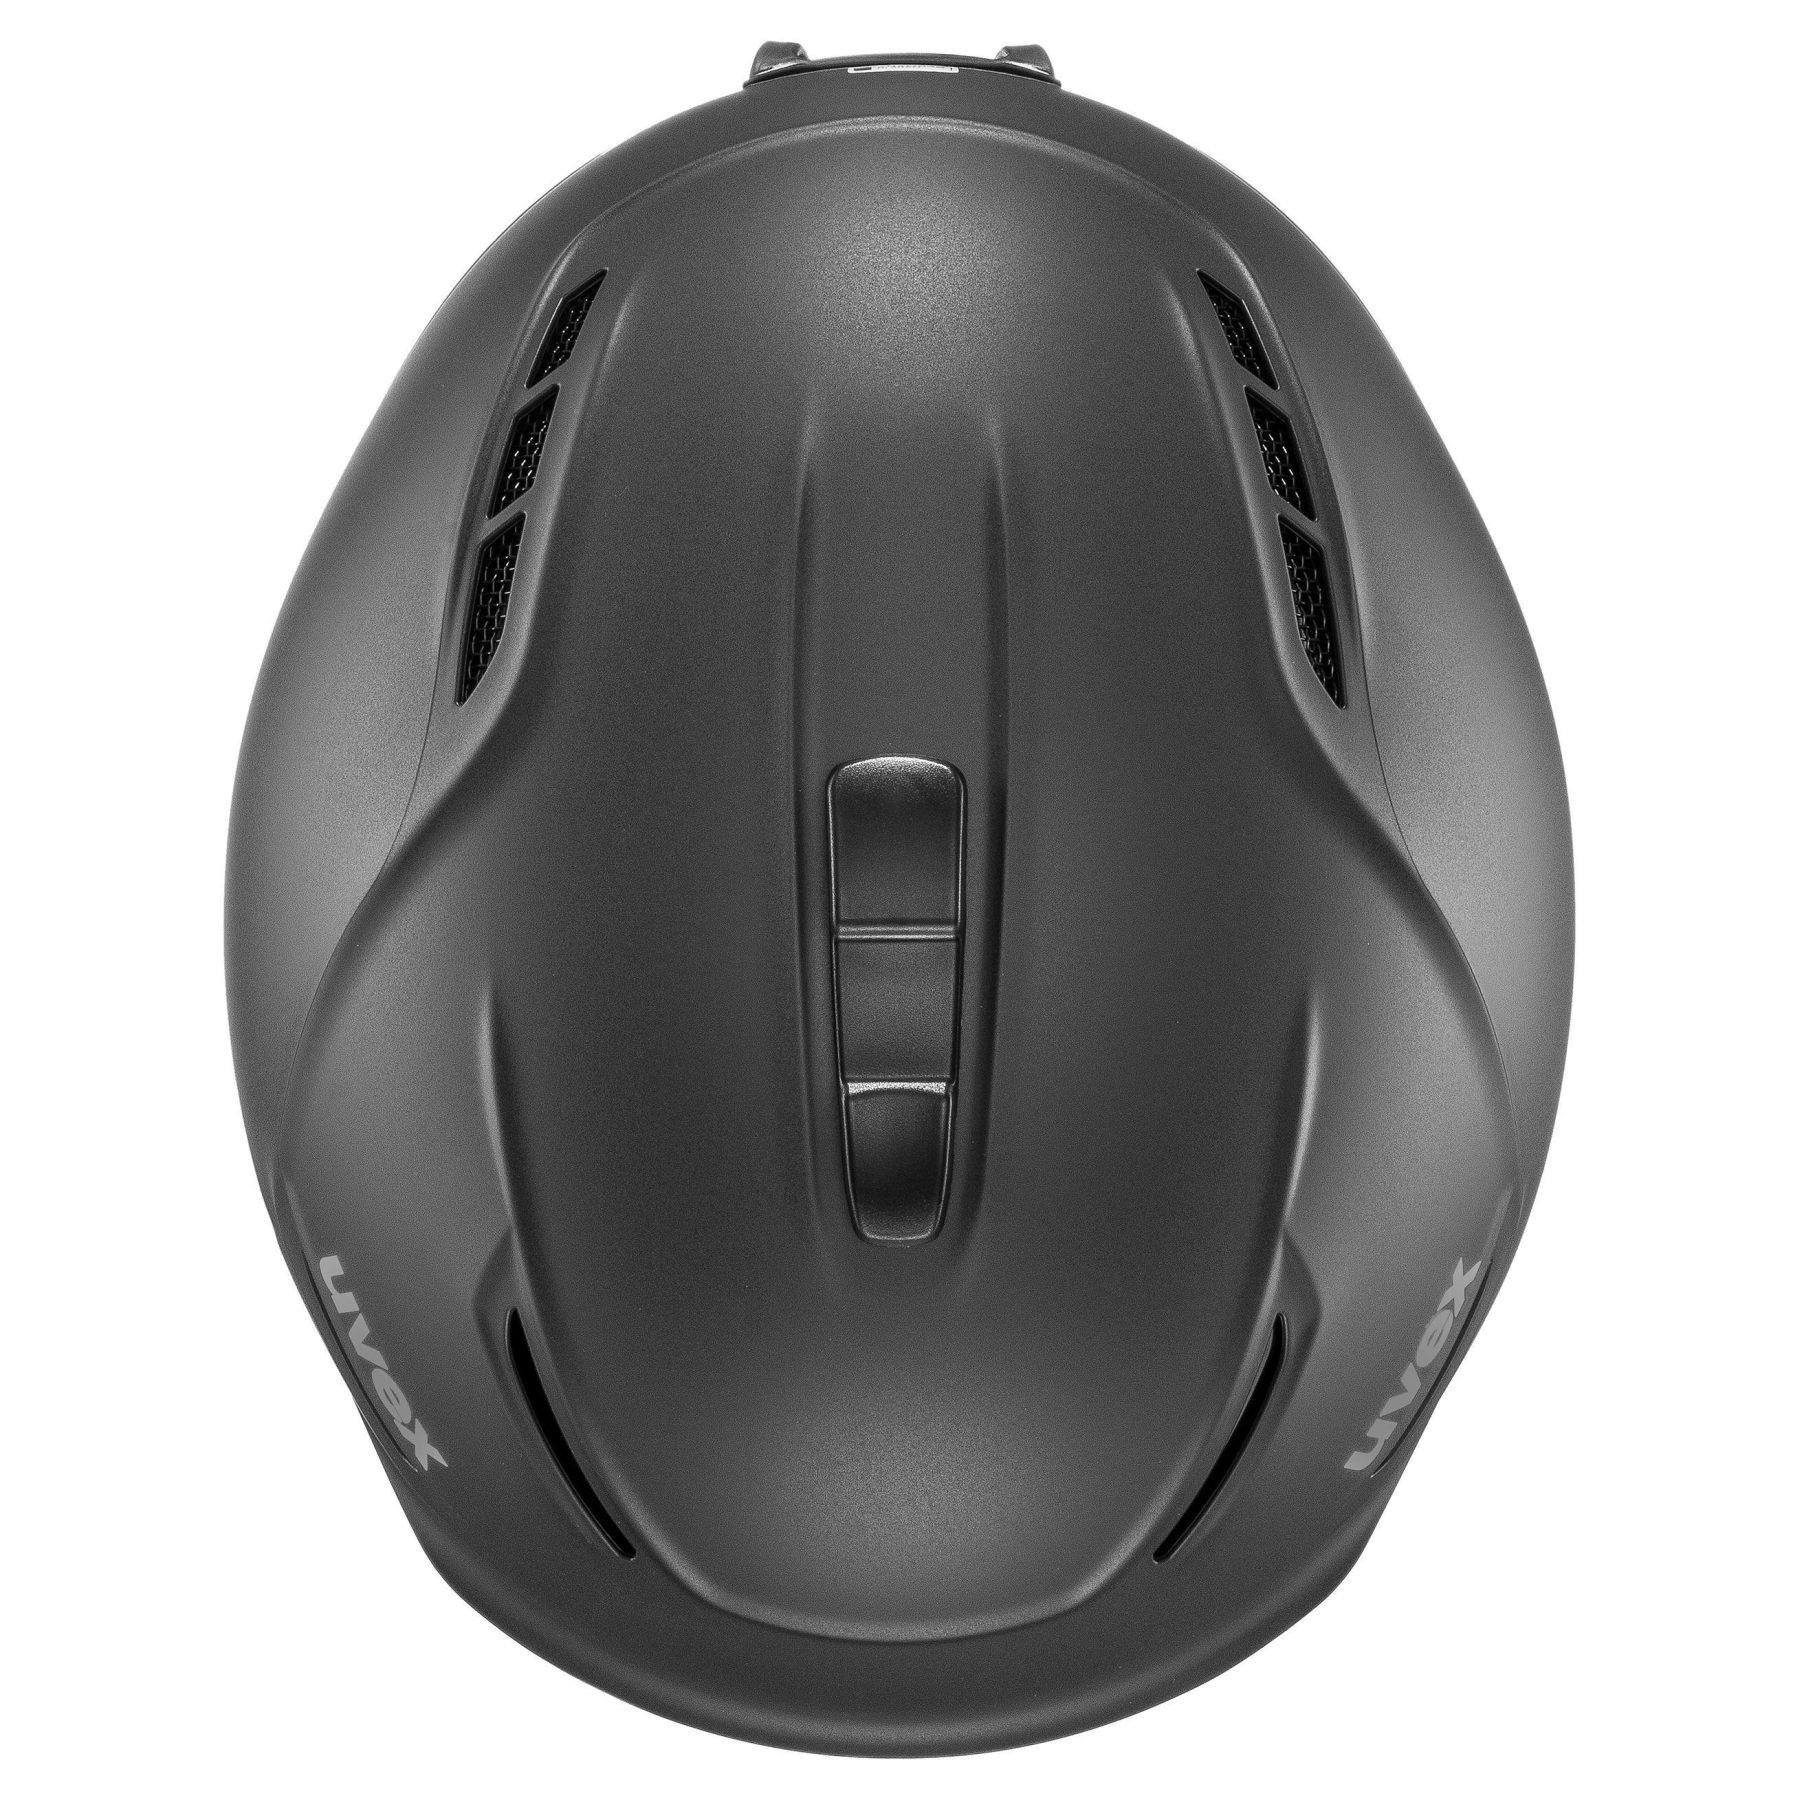 Kask Uvex p1us 2.0 Black | cena, raty sklep Komputronik.pl